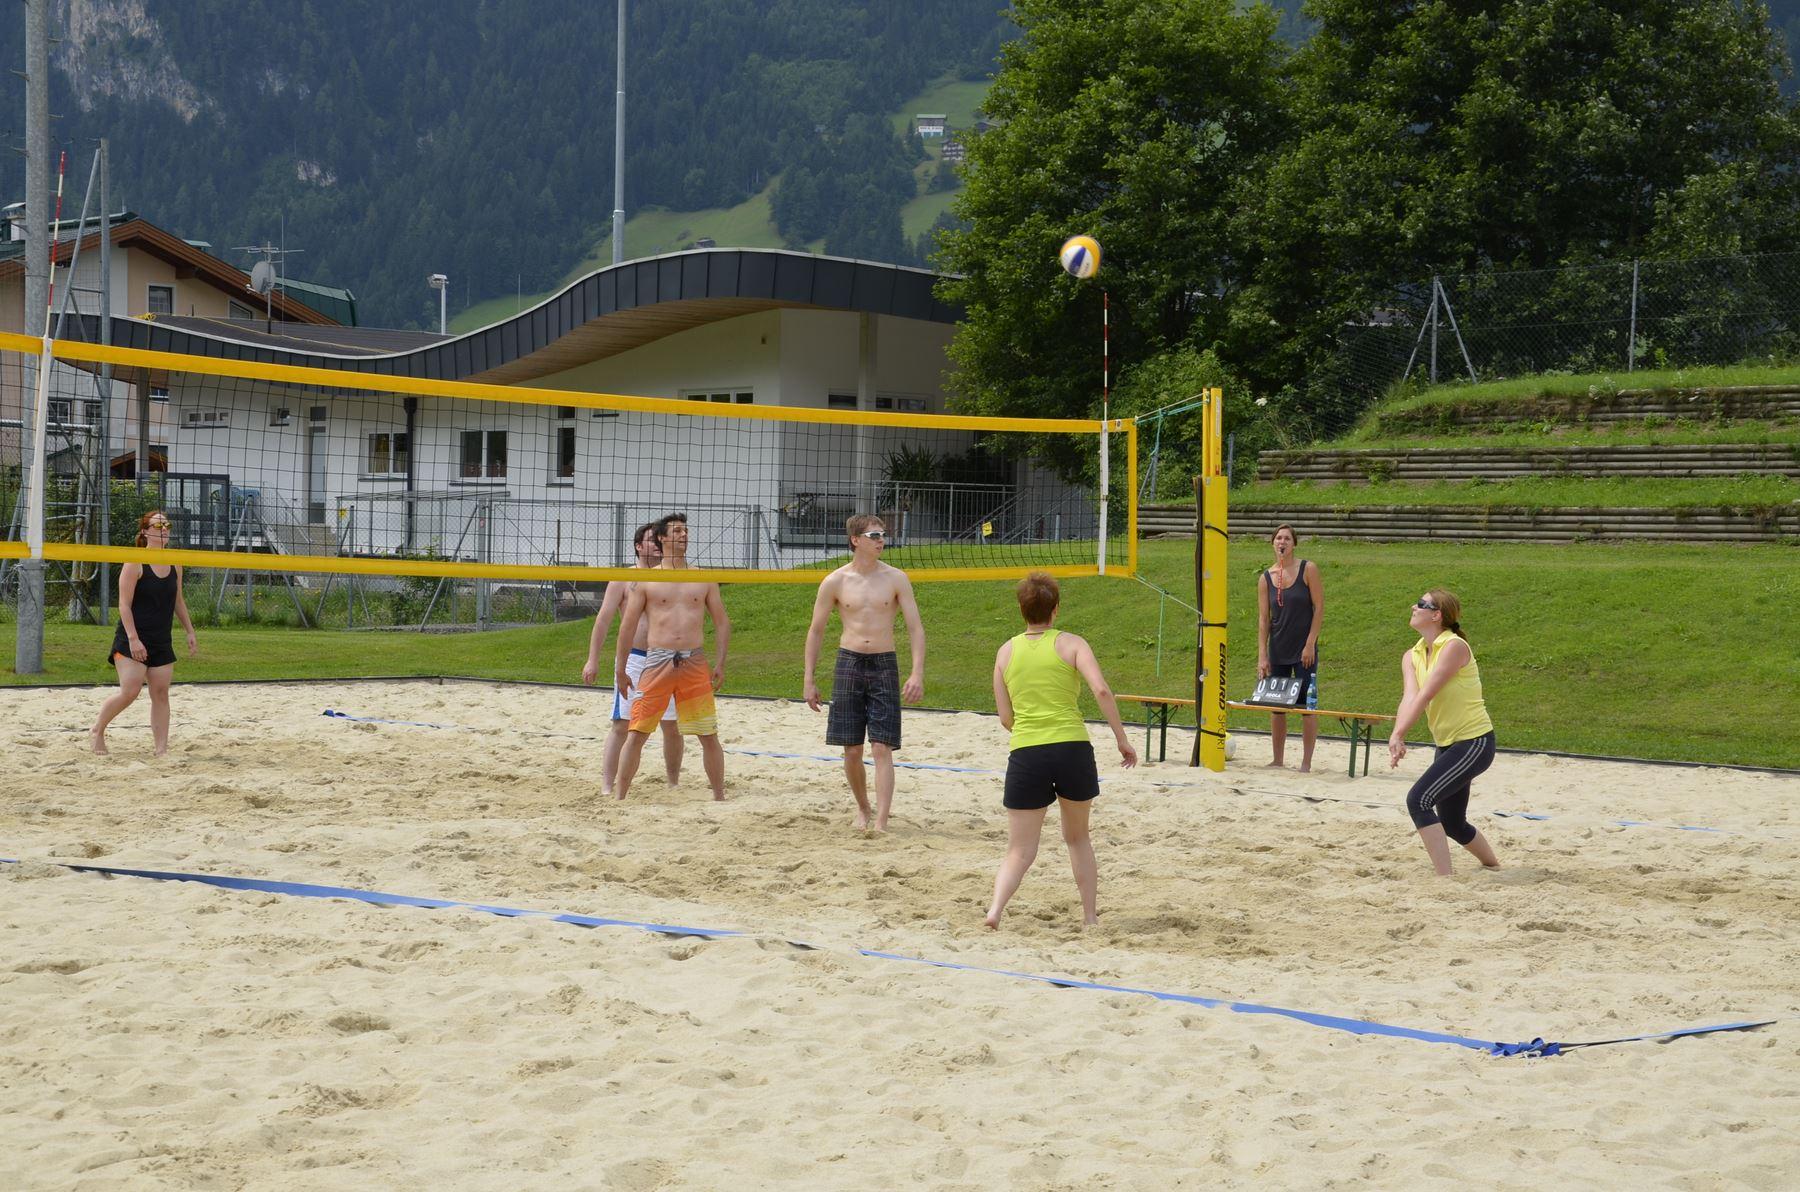 2016-07-02 Beachvolleyball 052